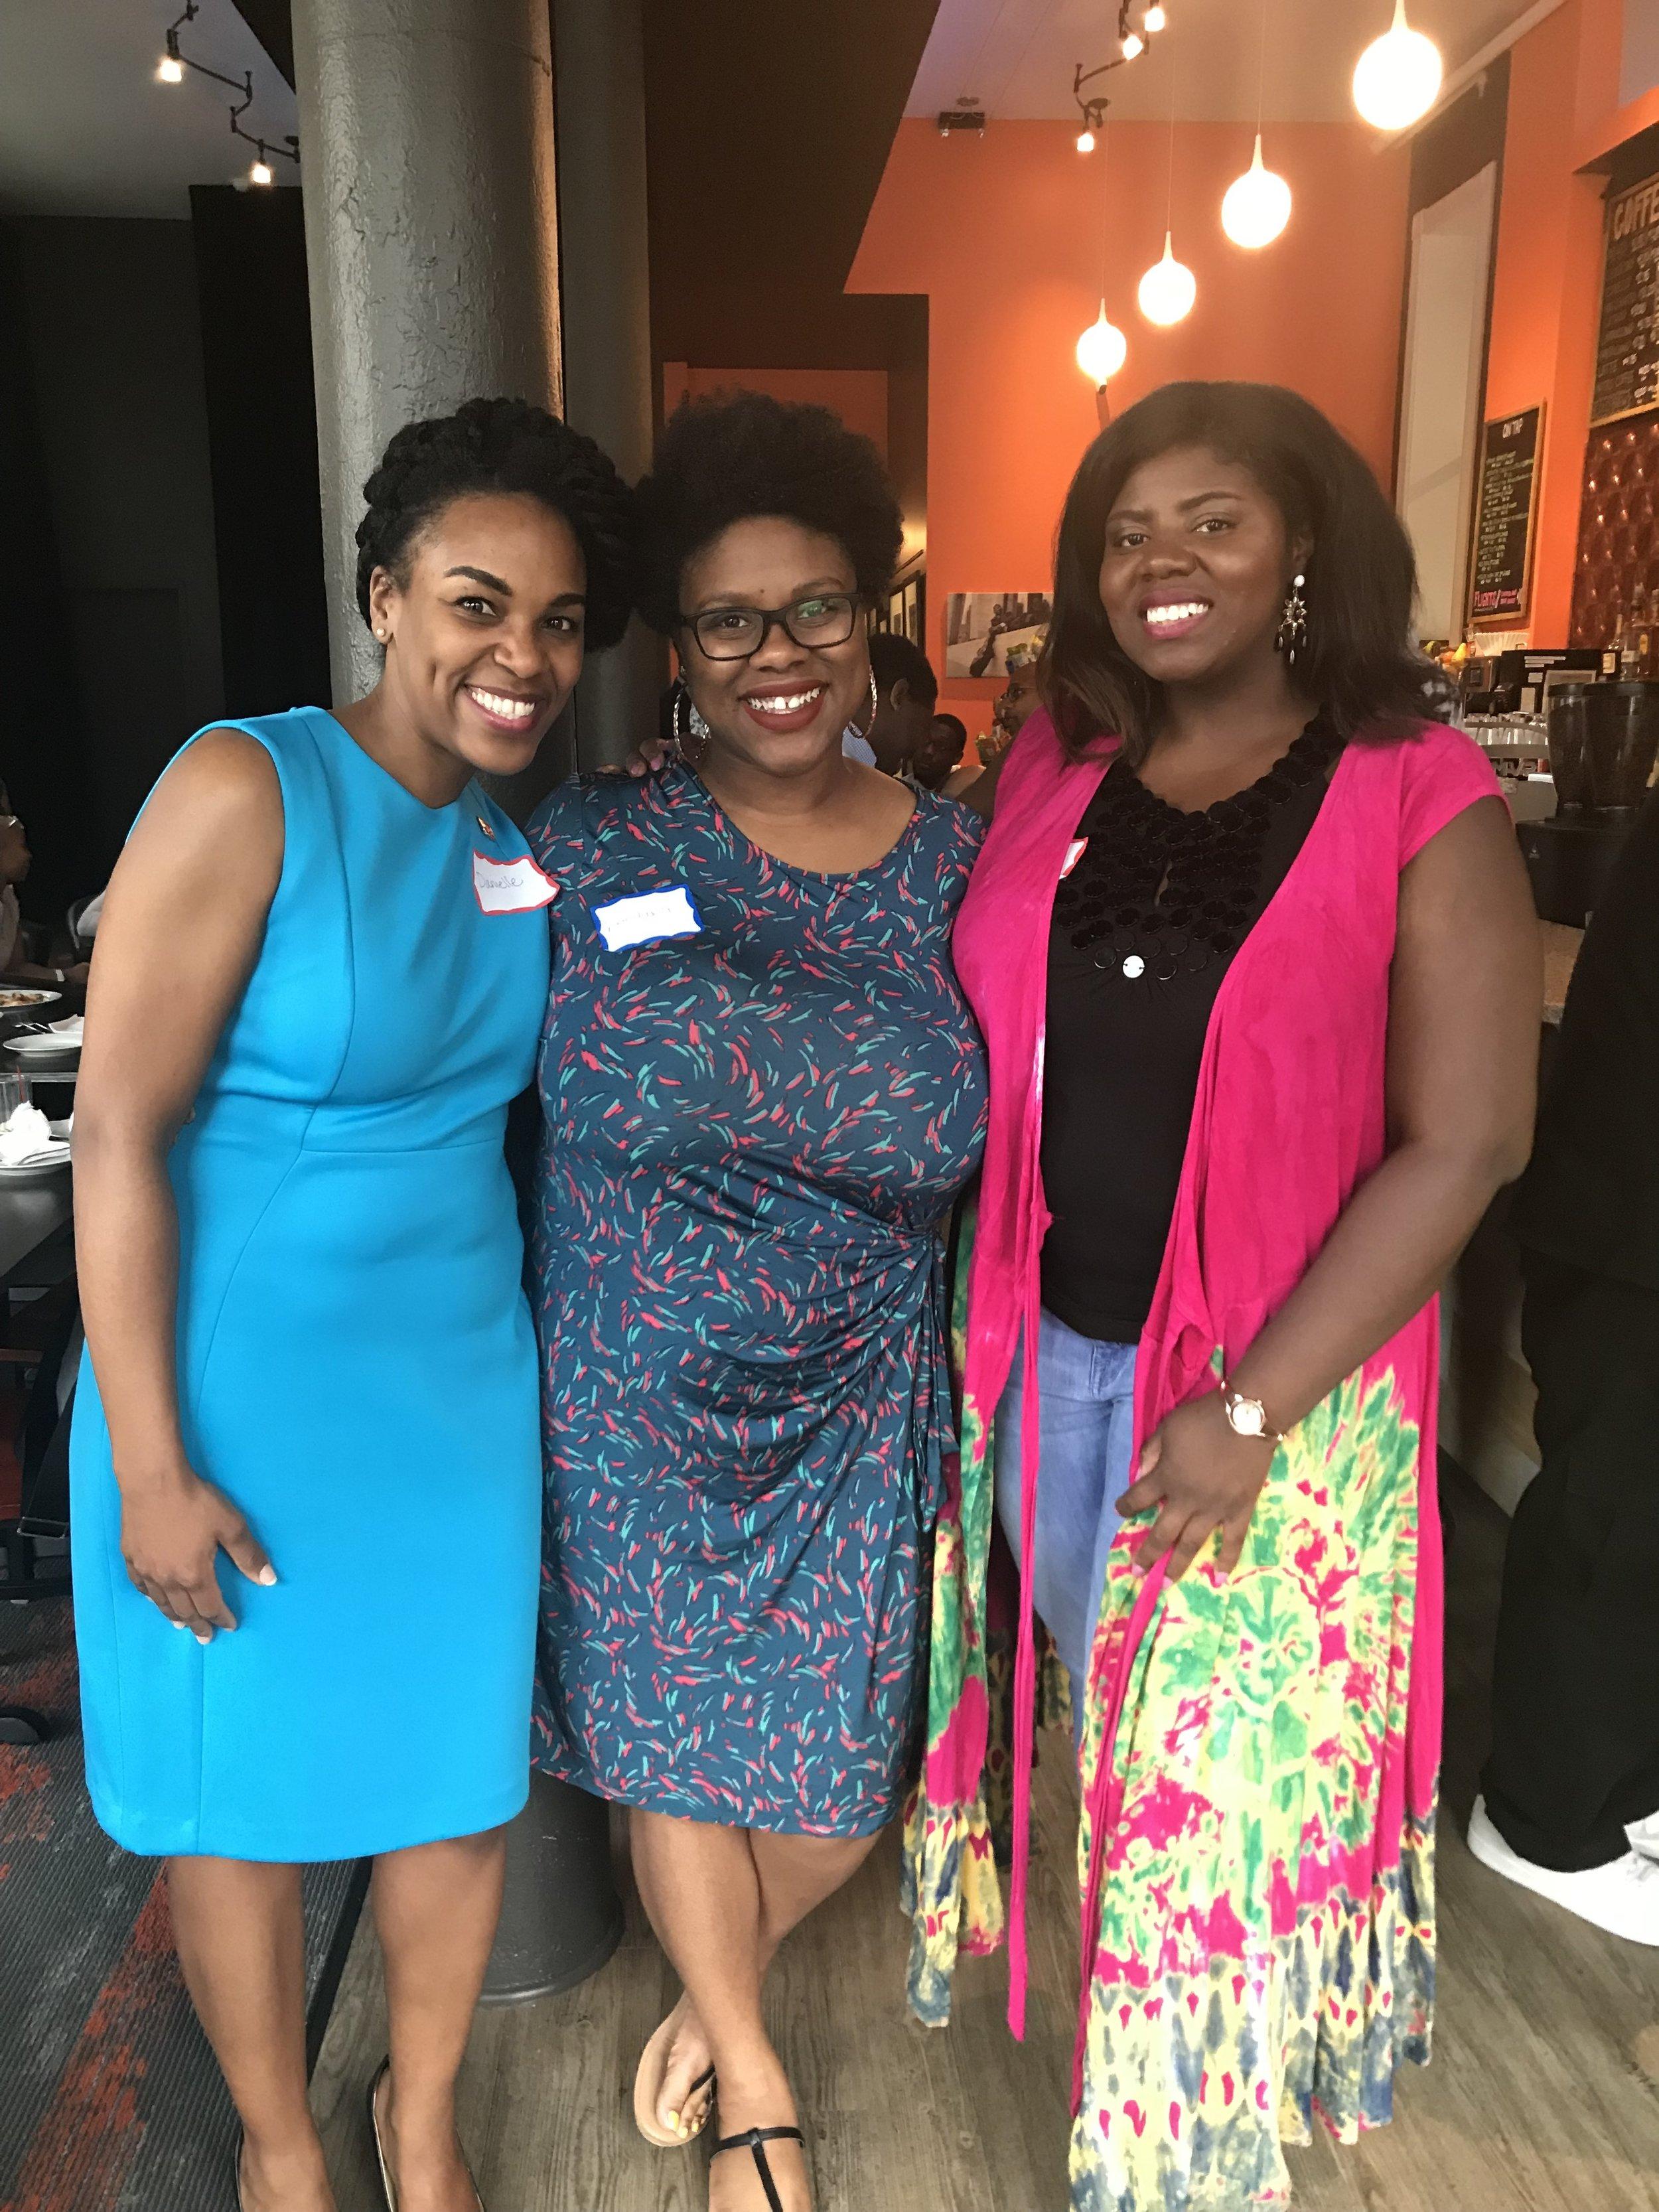 Danielle Jones, Keeyana Avery and Jenifer Moor at the recent PRSA Black PR Pros happy hour.